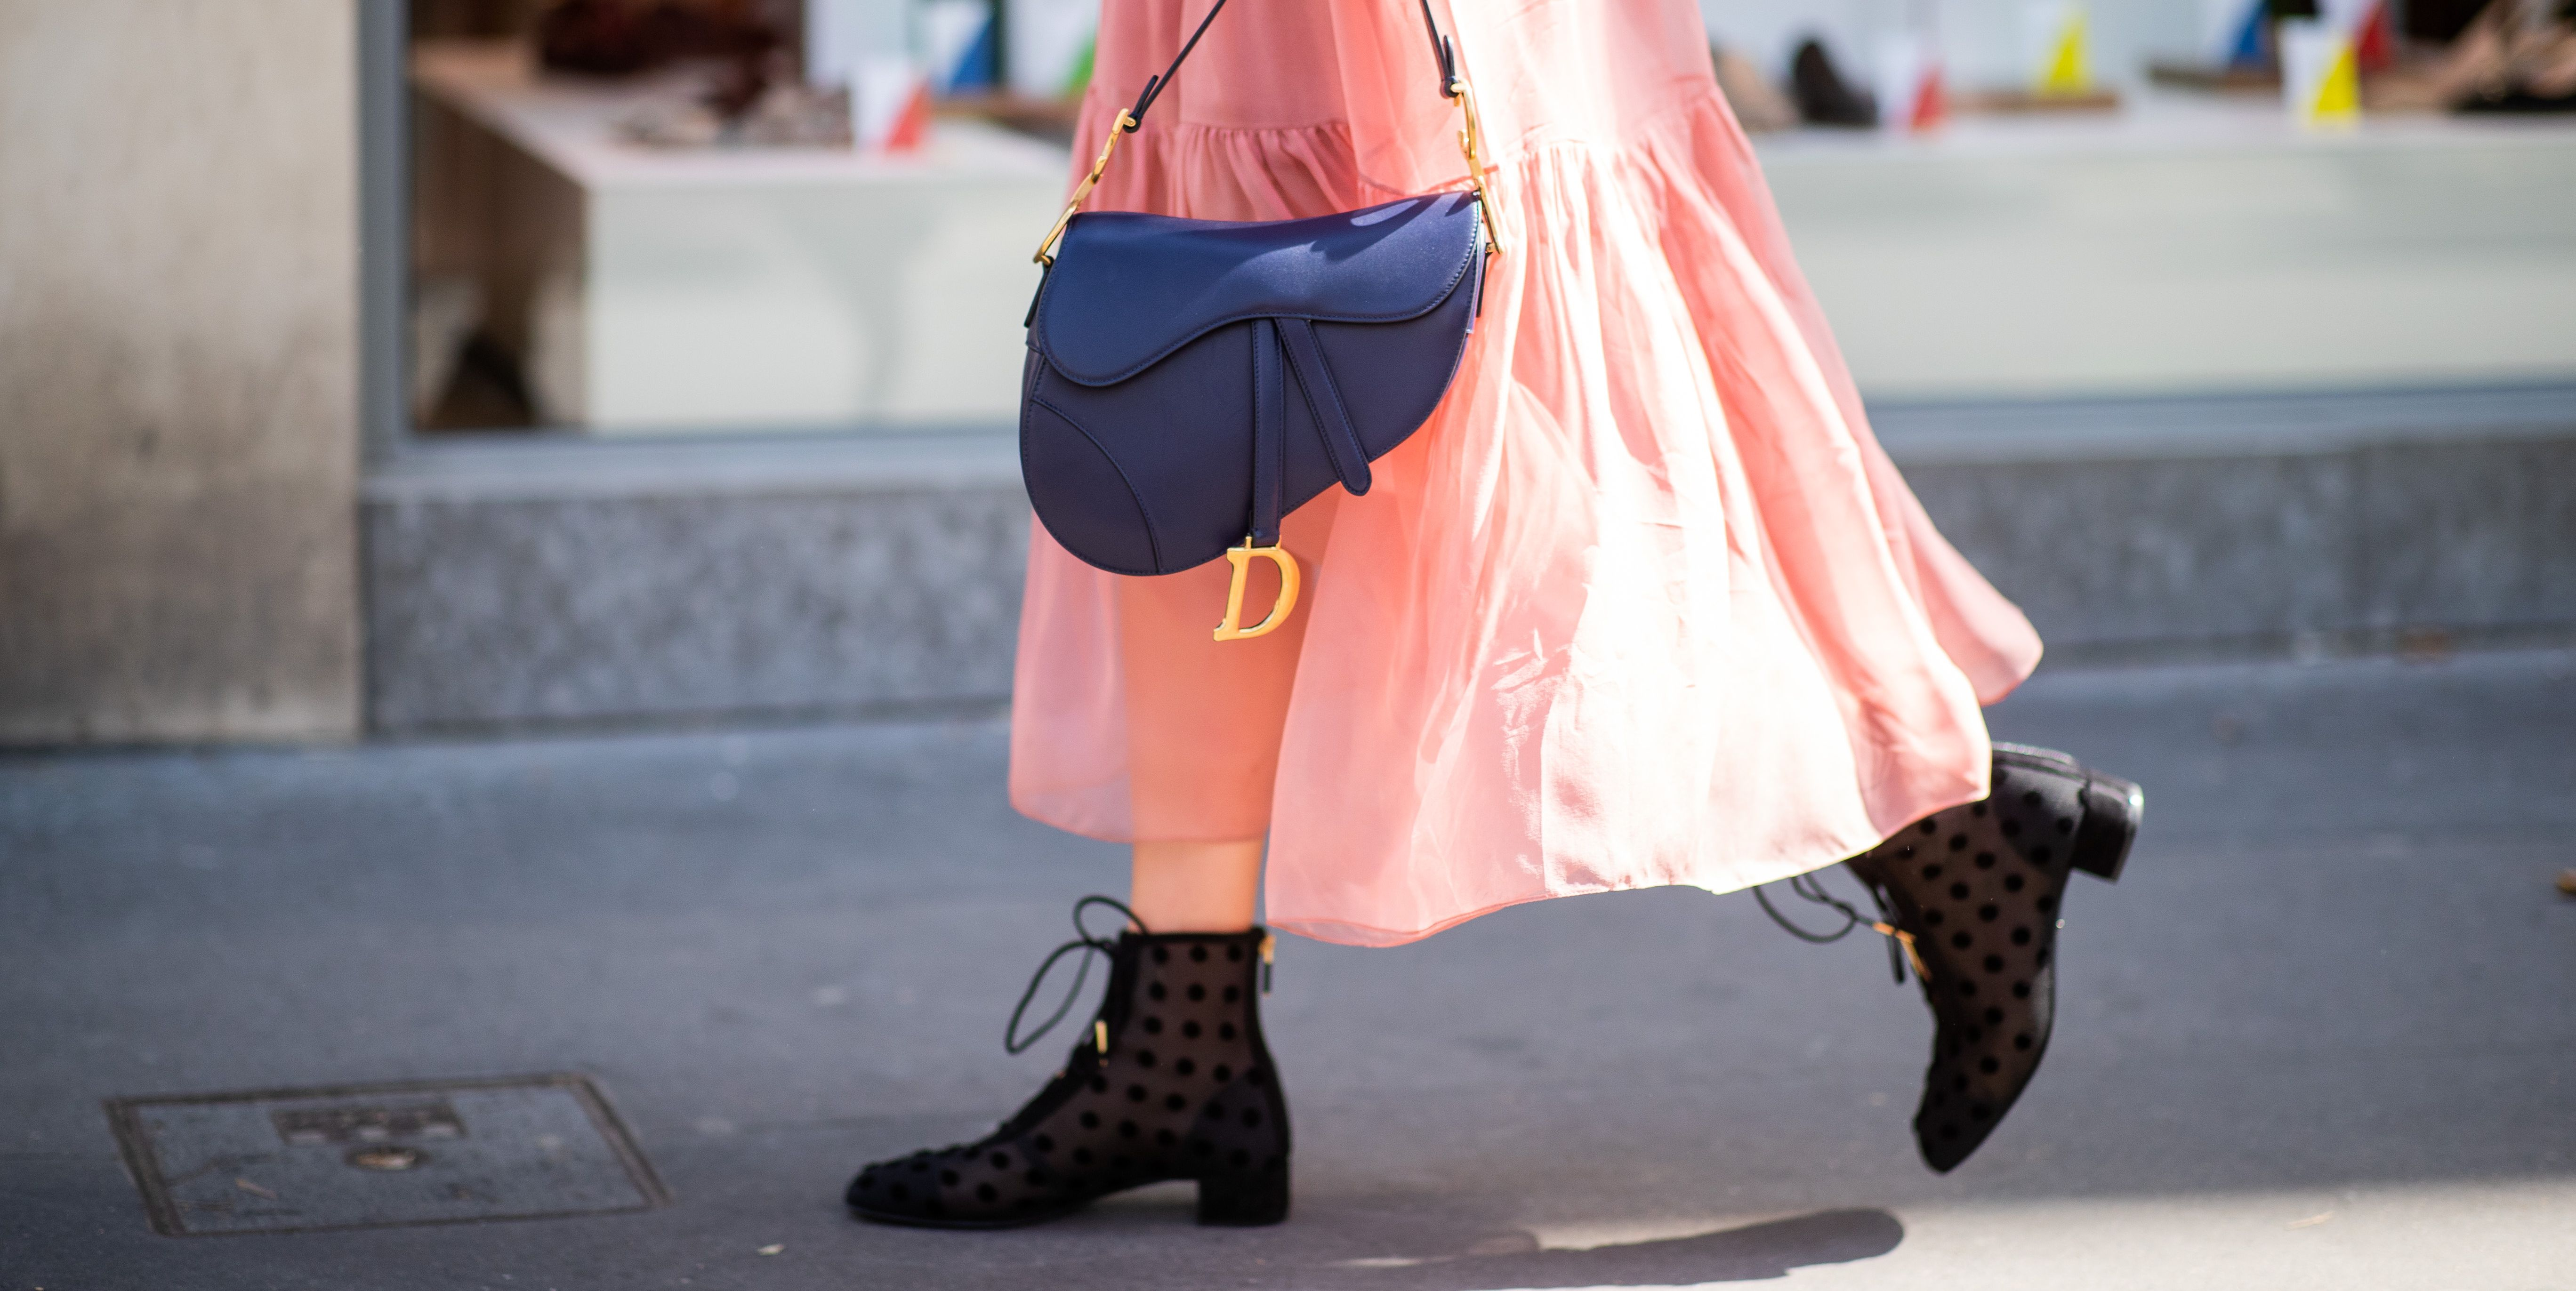 moda stivaletti inverno 2019, tendenza stivaletti 2019, stivaletti stringati, tendenza stivaletti stringati inverno 2019